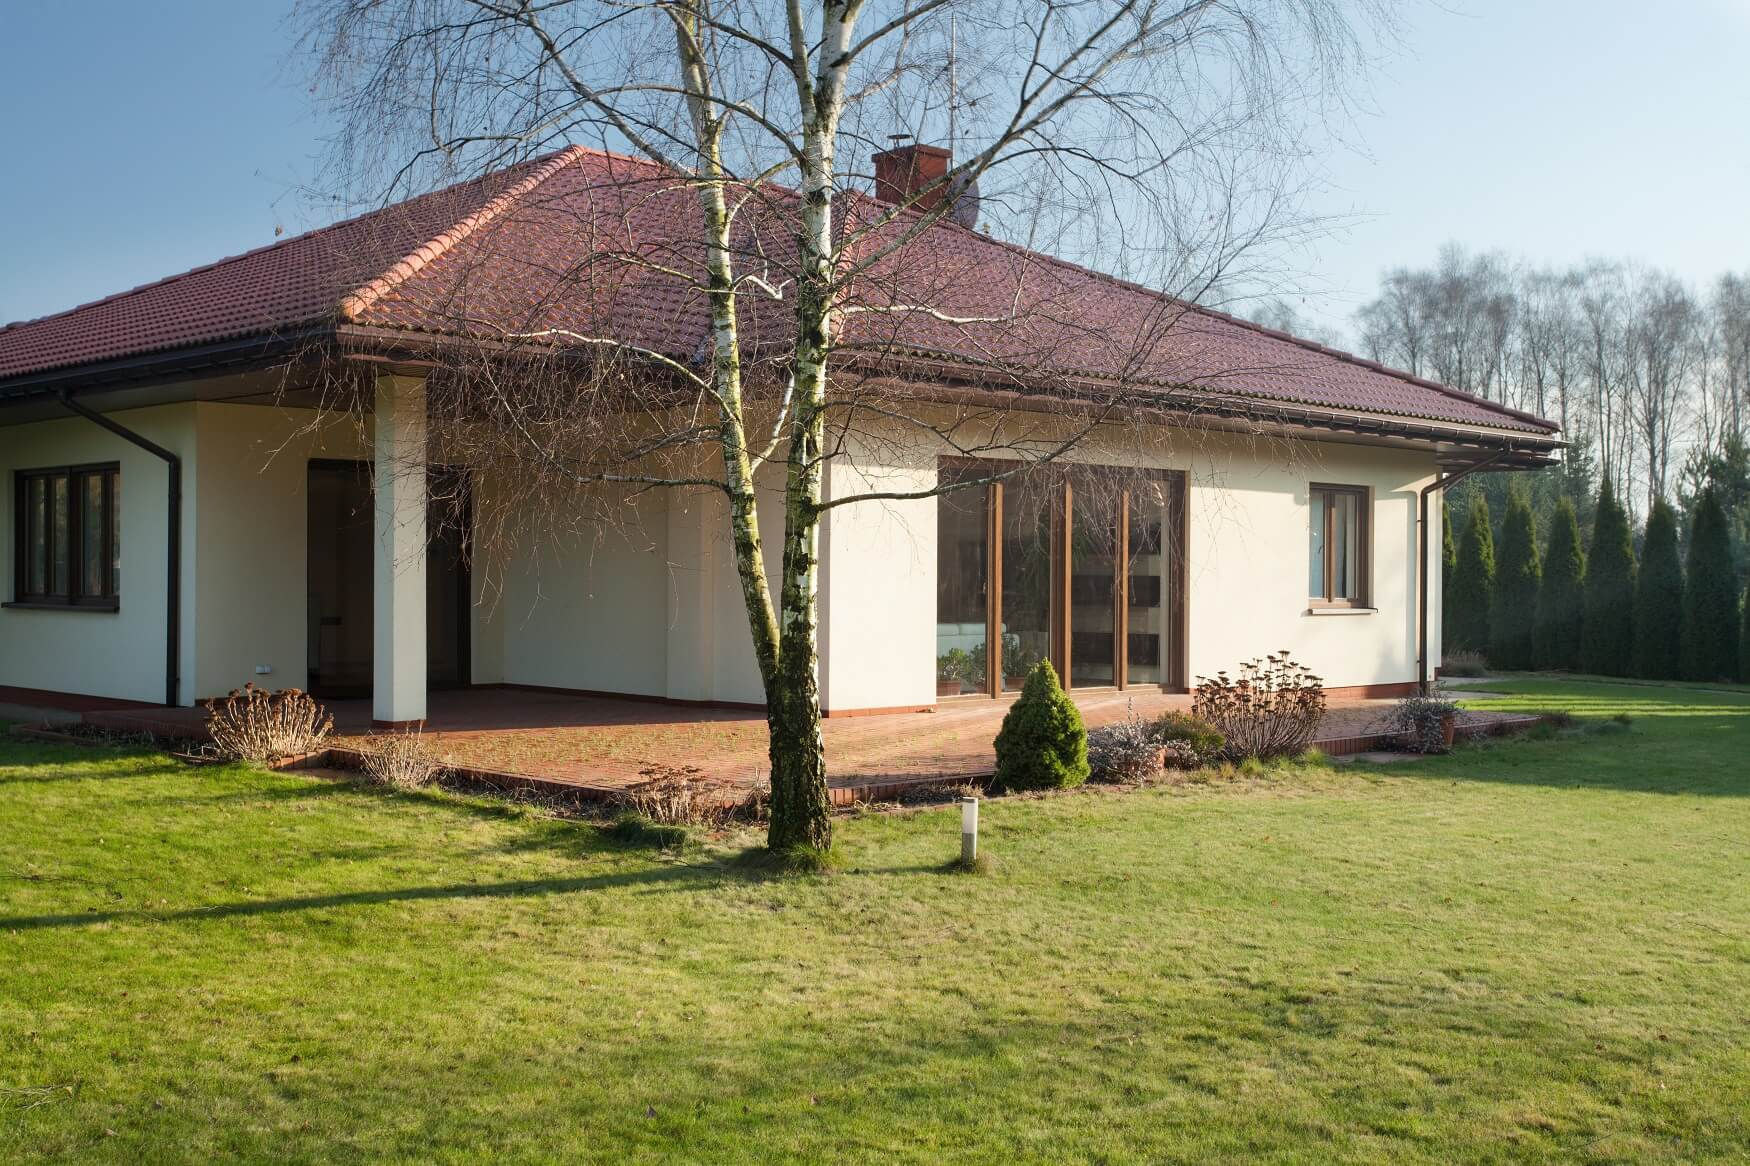 T-modern Okna opływowy kształt